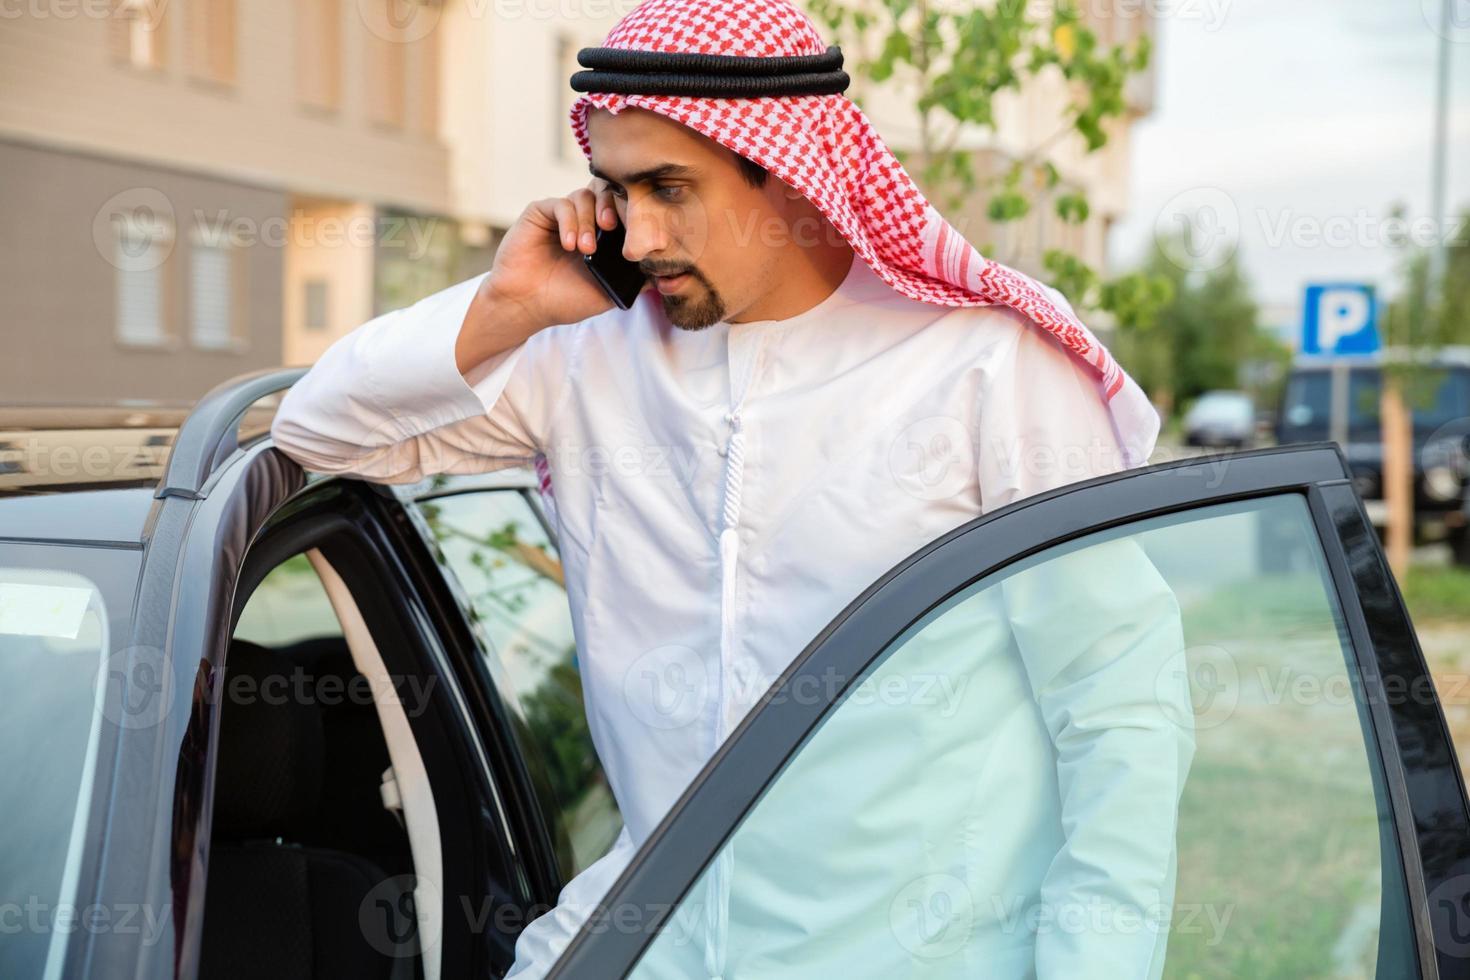 Young Arabian Next To Car photo